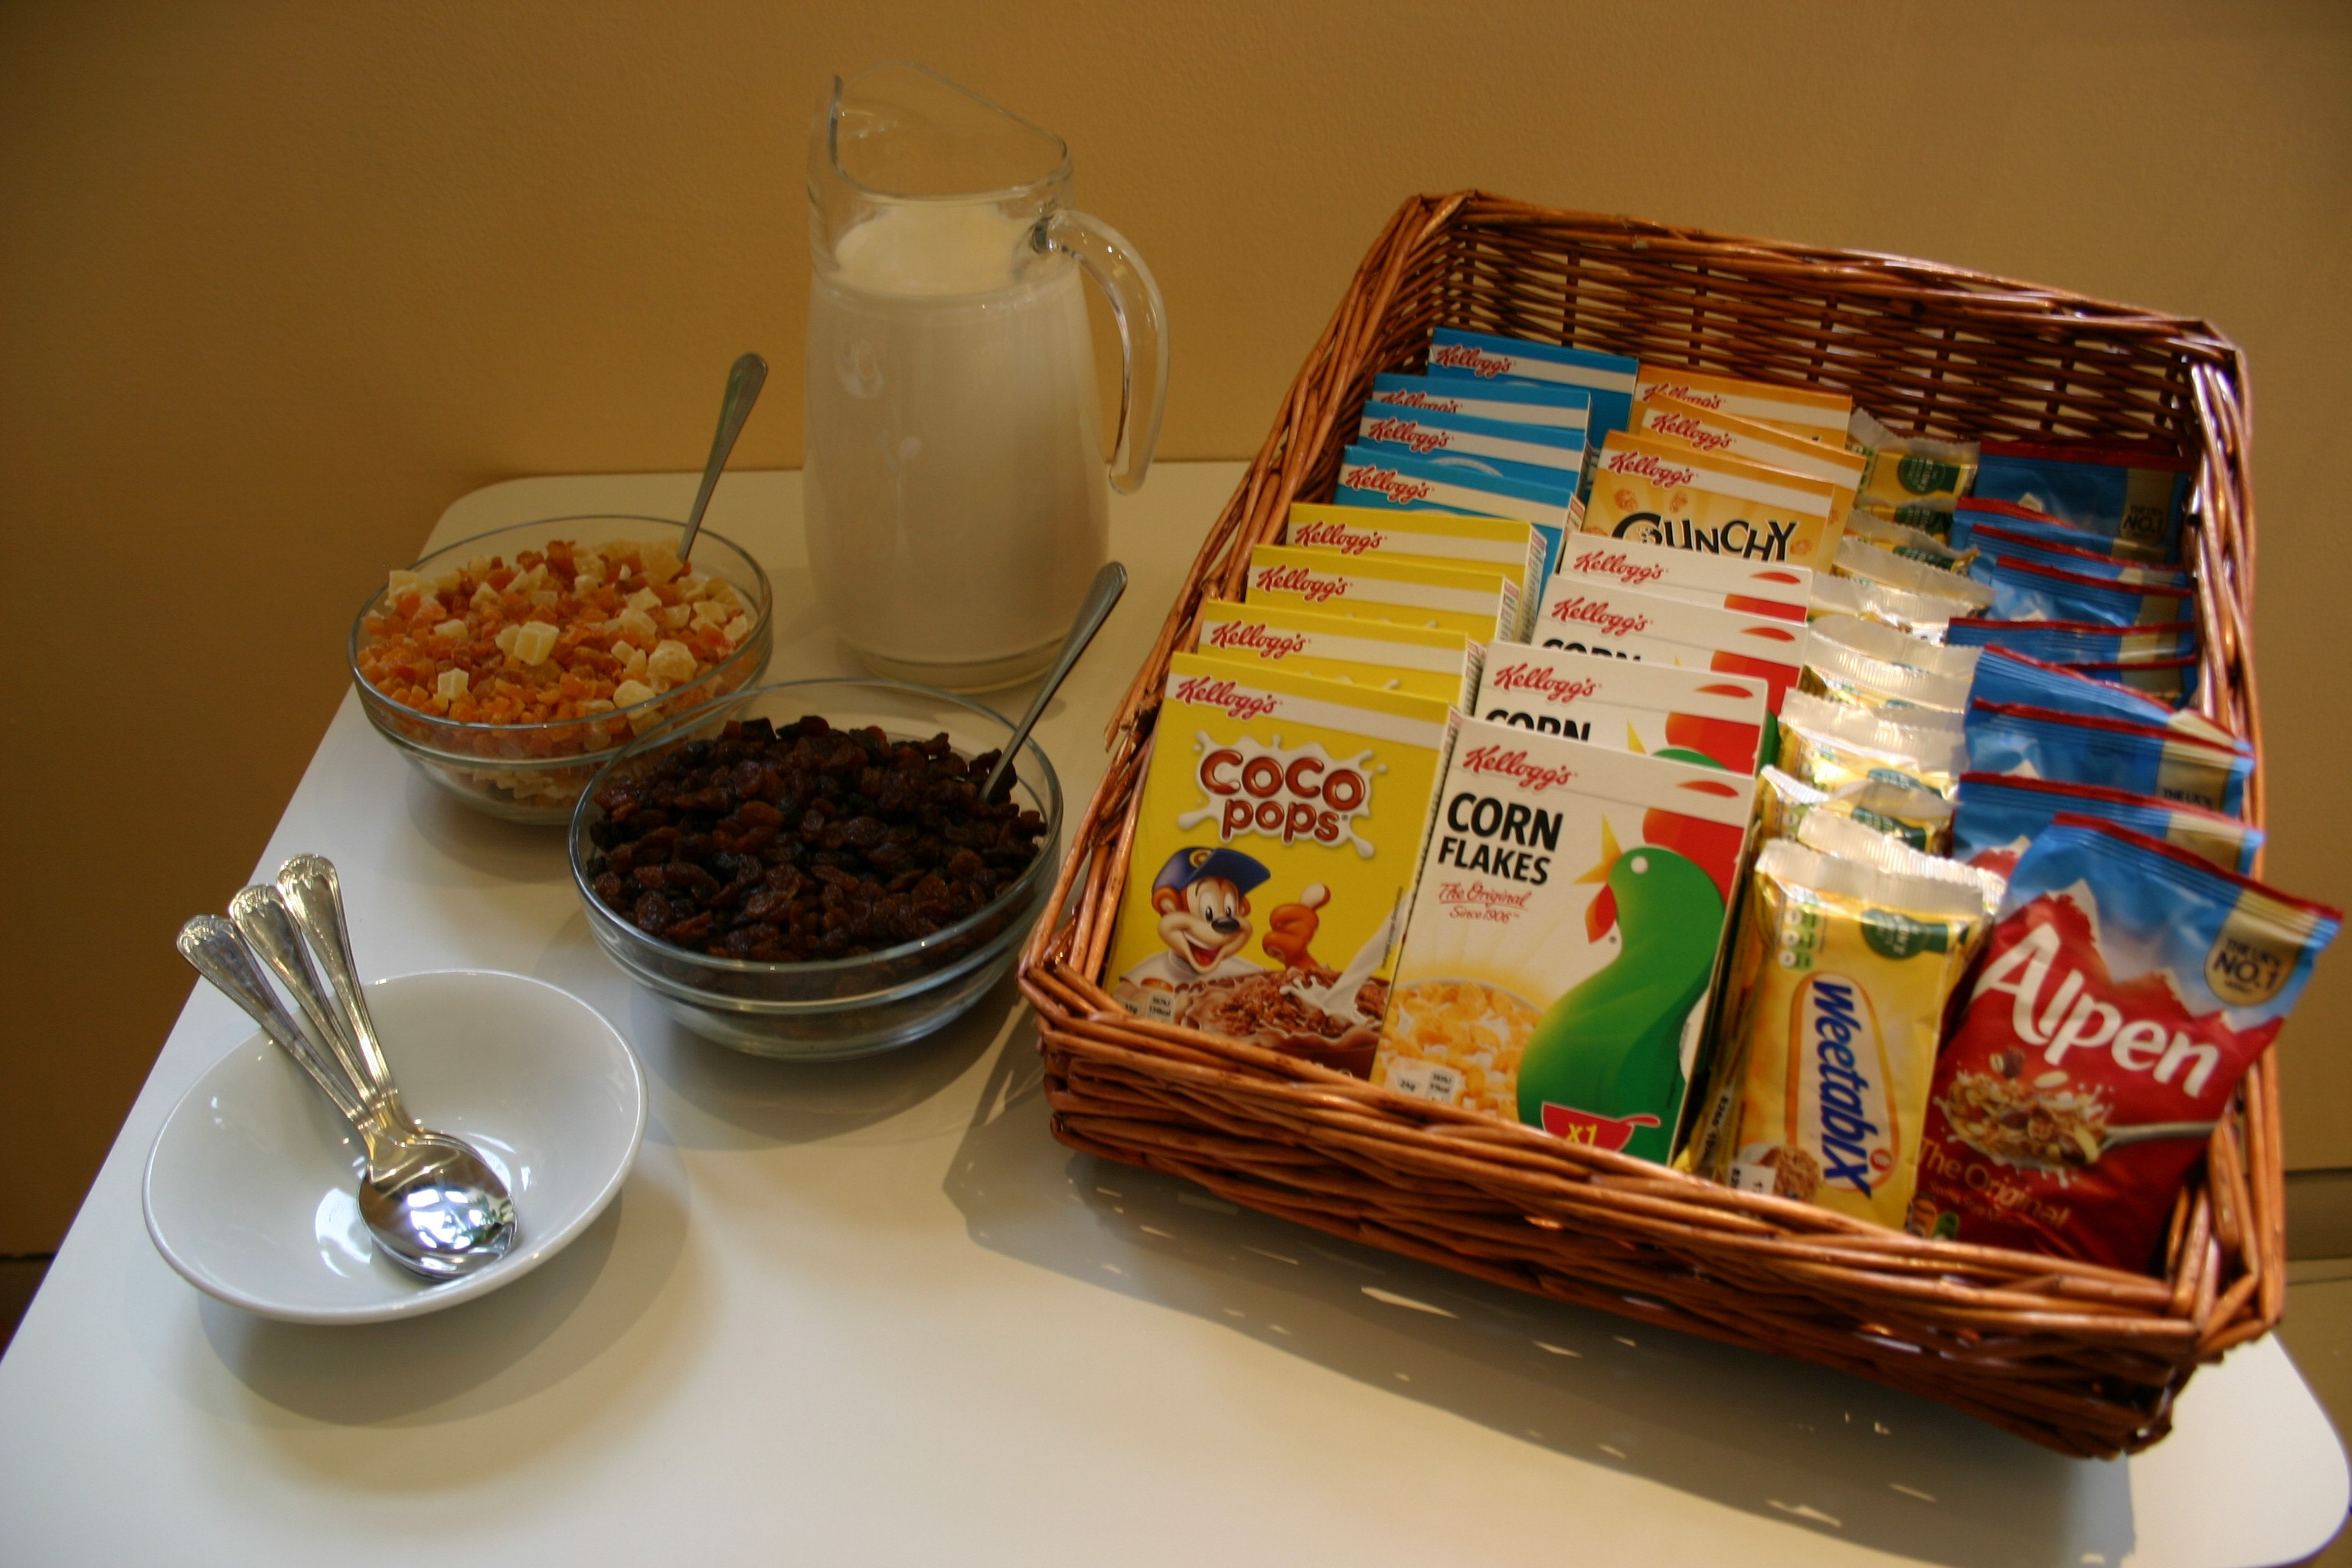 food 8.JPG - Cereal